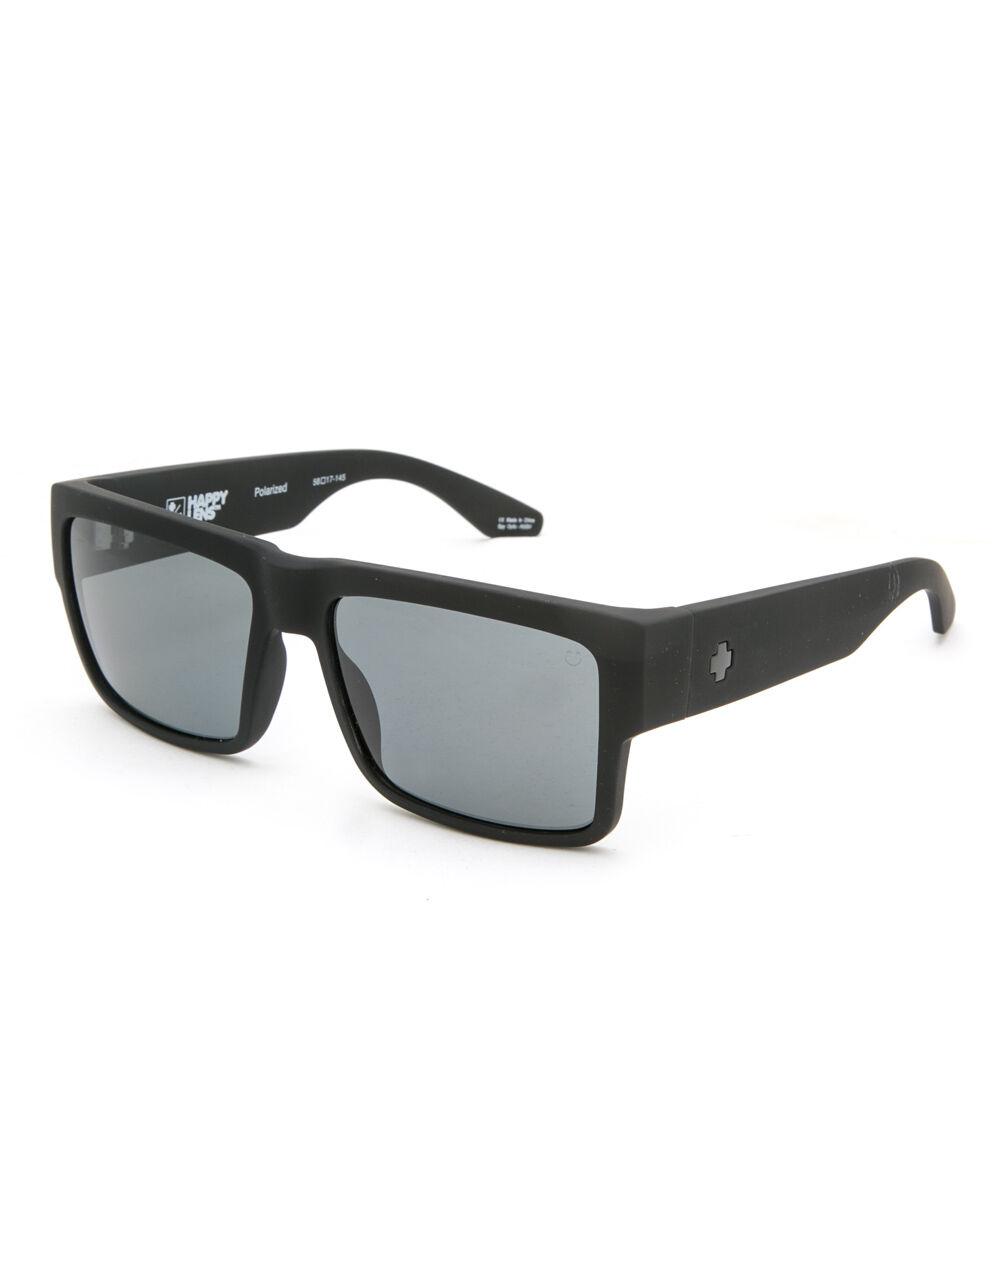 SPY Cyrus Polarized Sunglasses